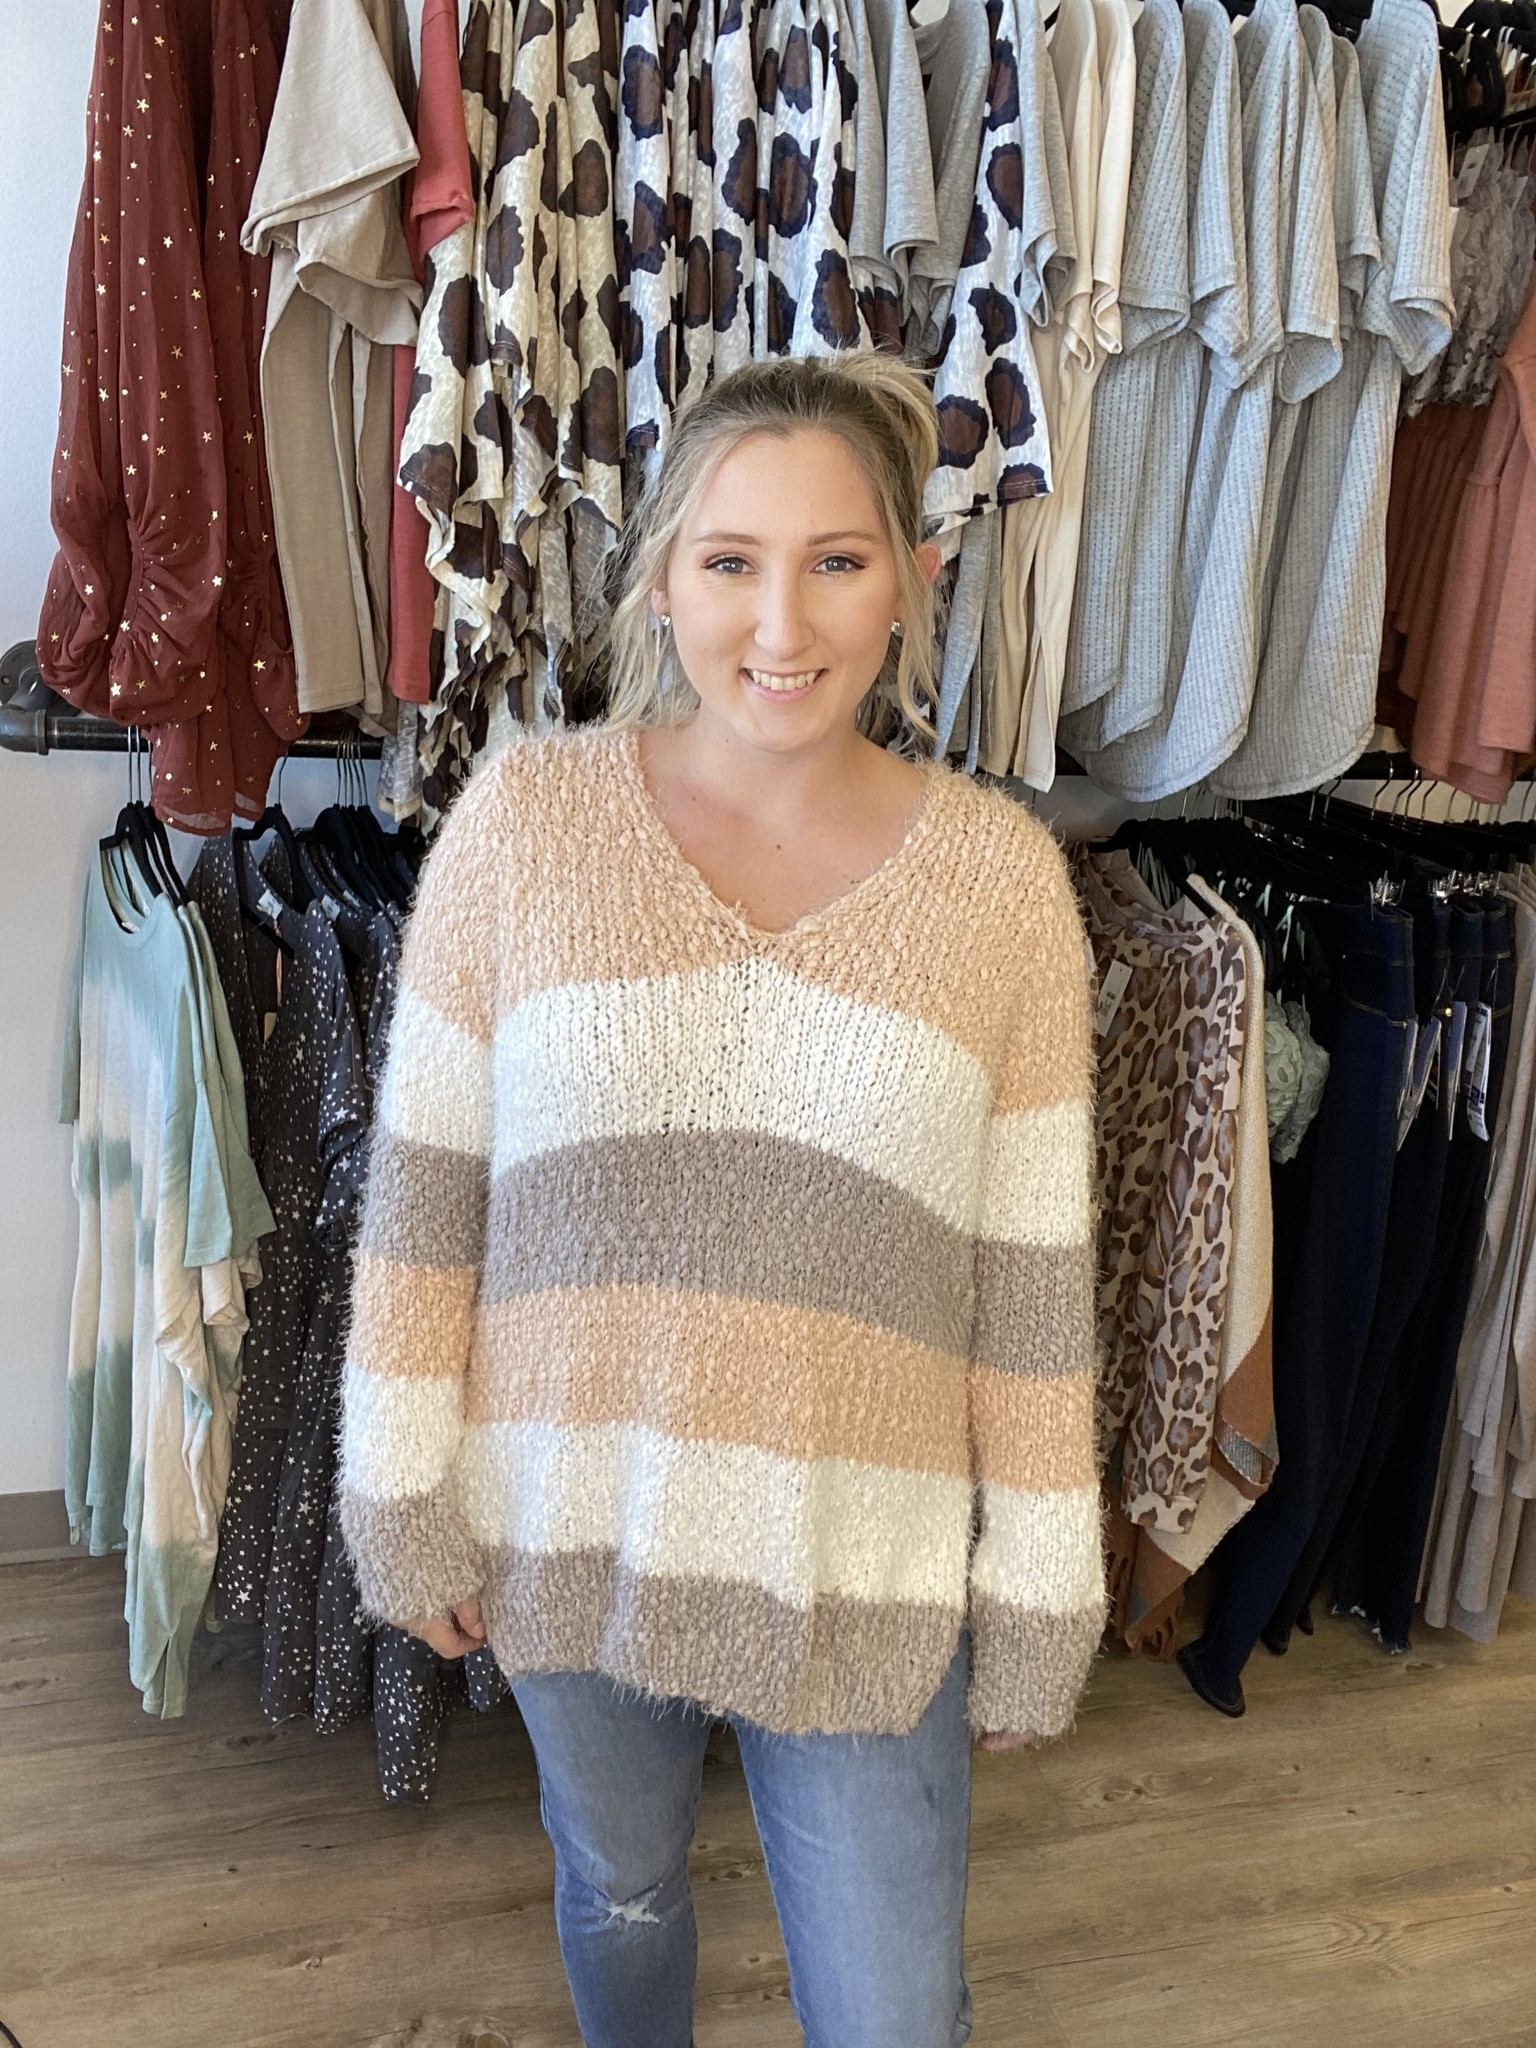 BB Fire Side Chats Popcorn Sweater 3257